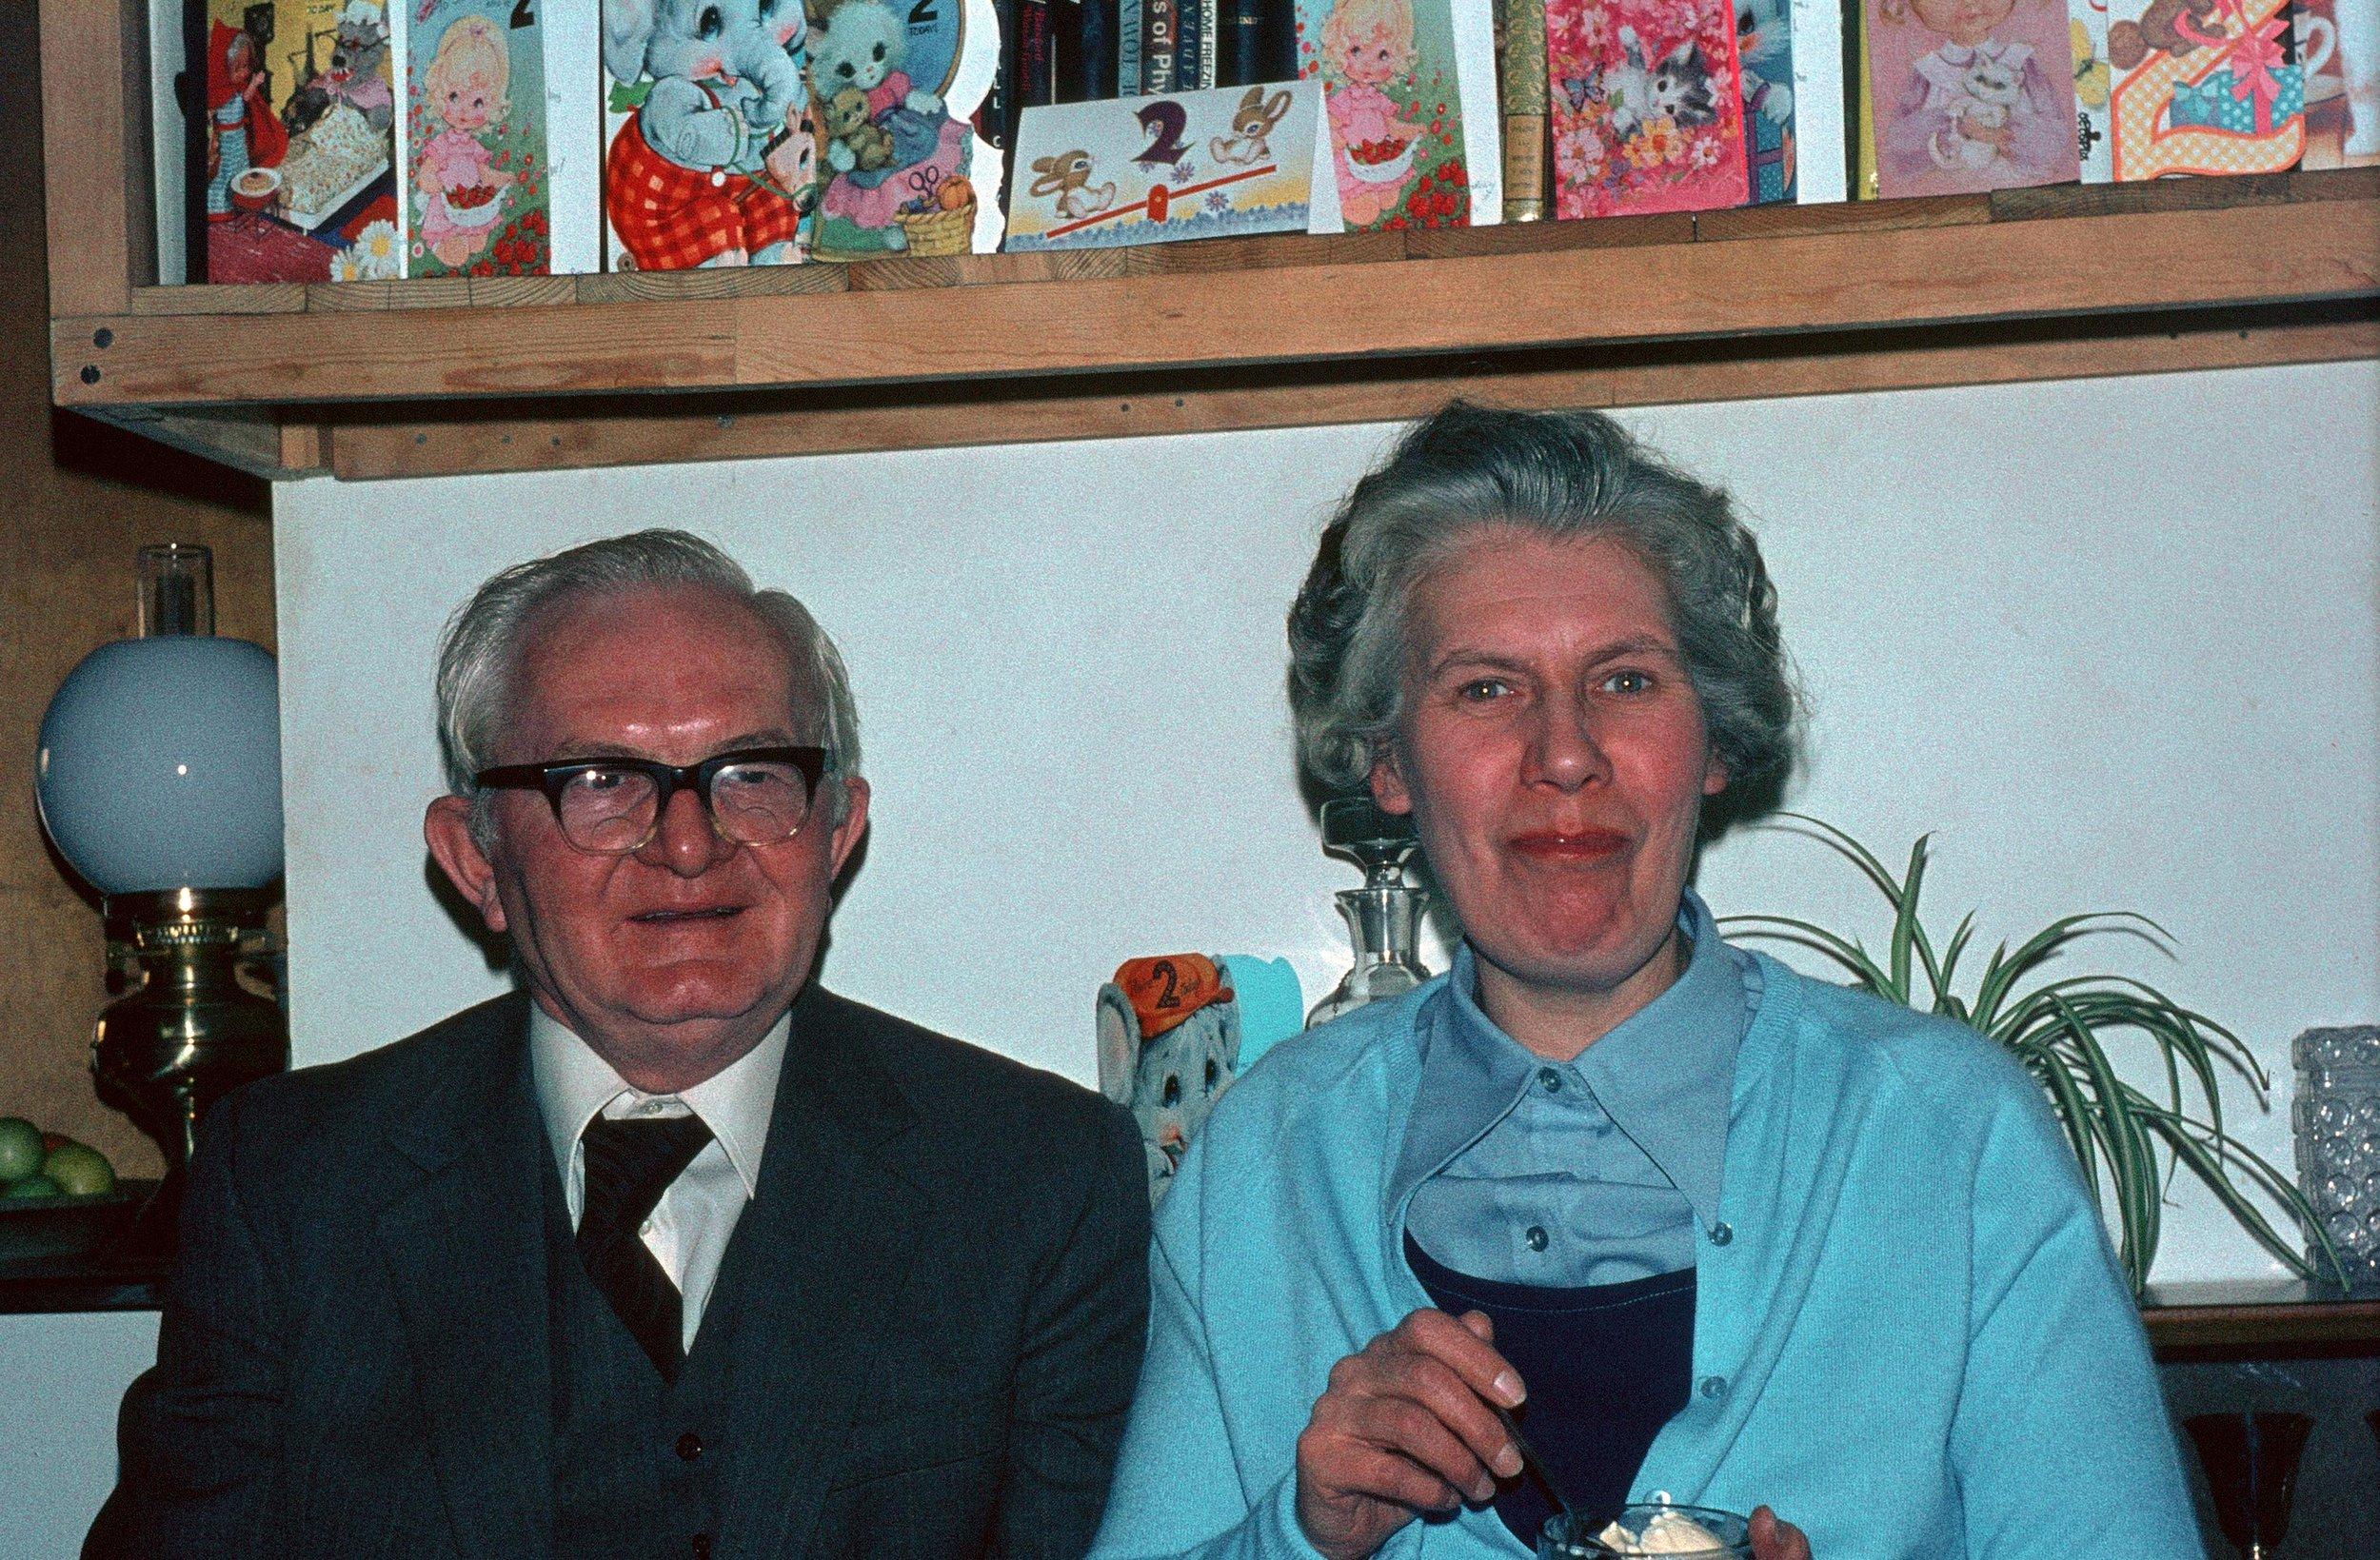 My paternal grandparents.